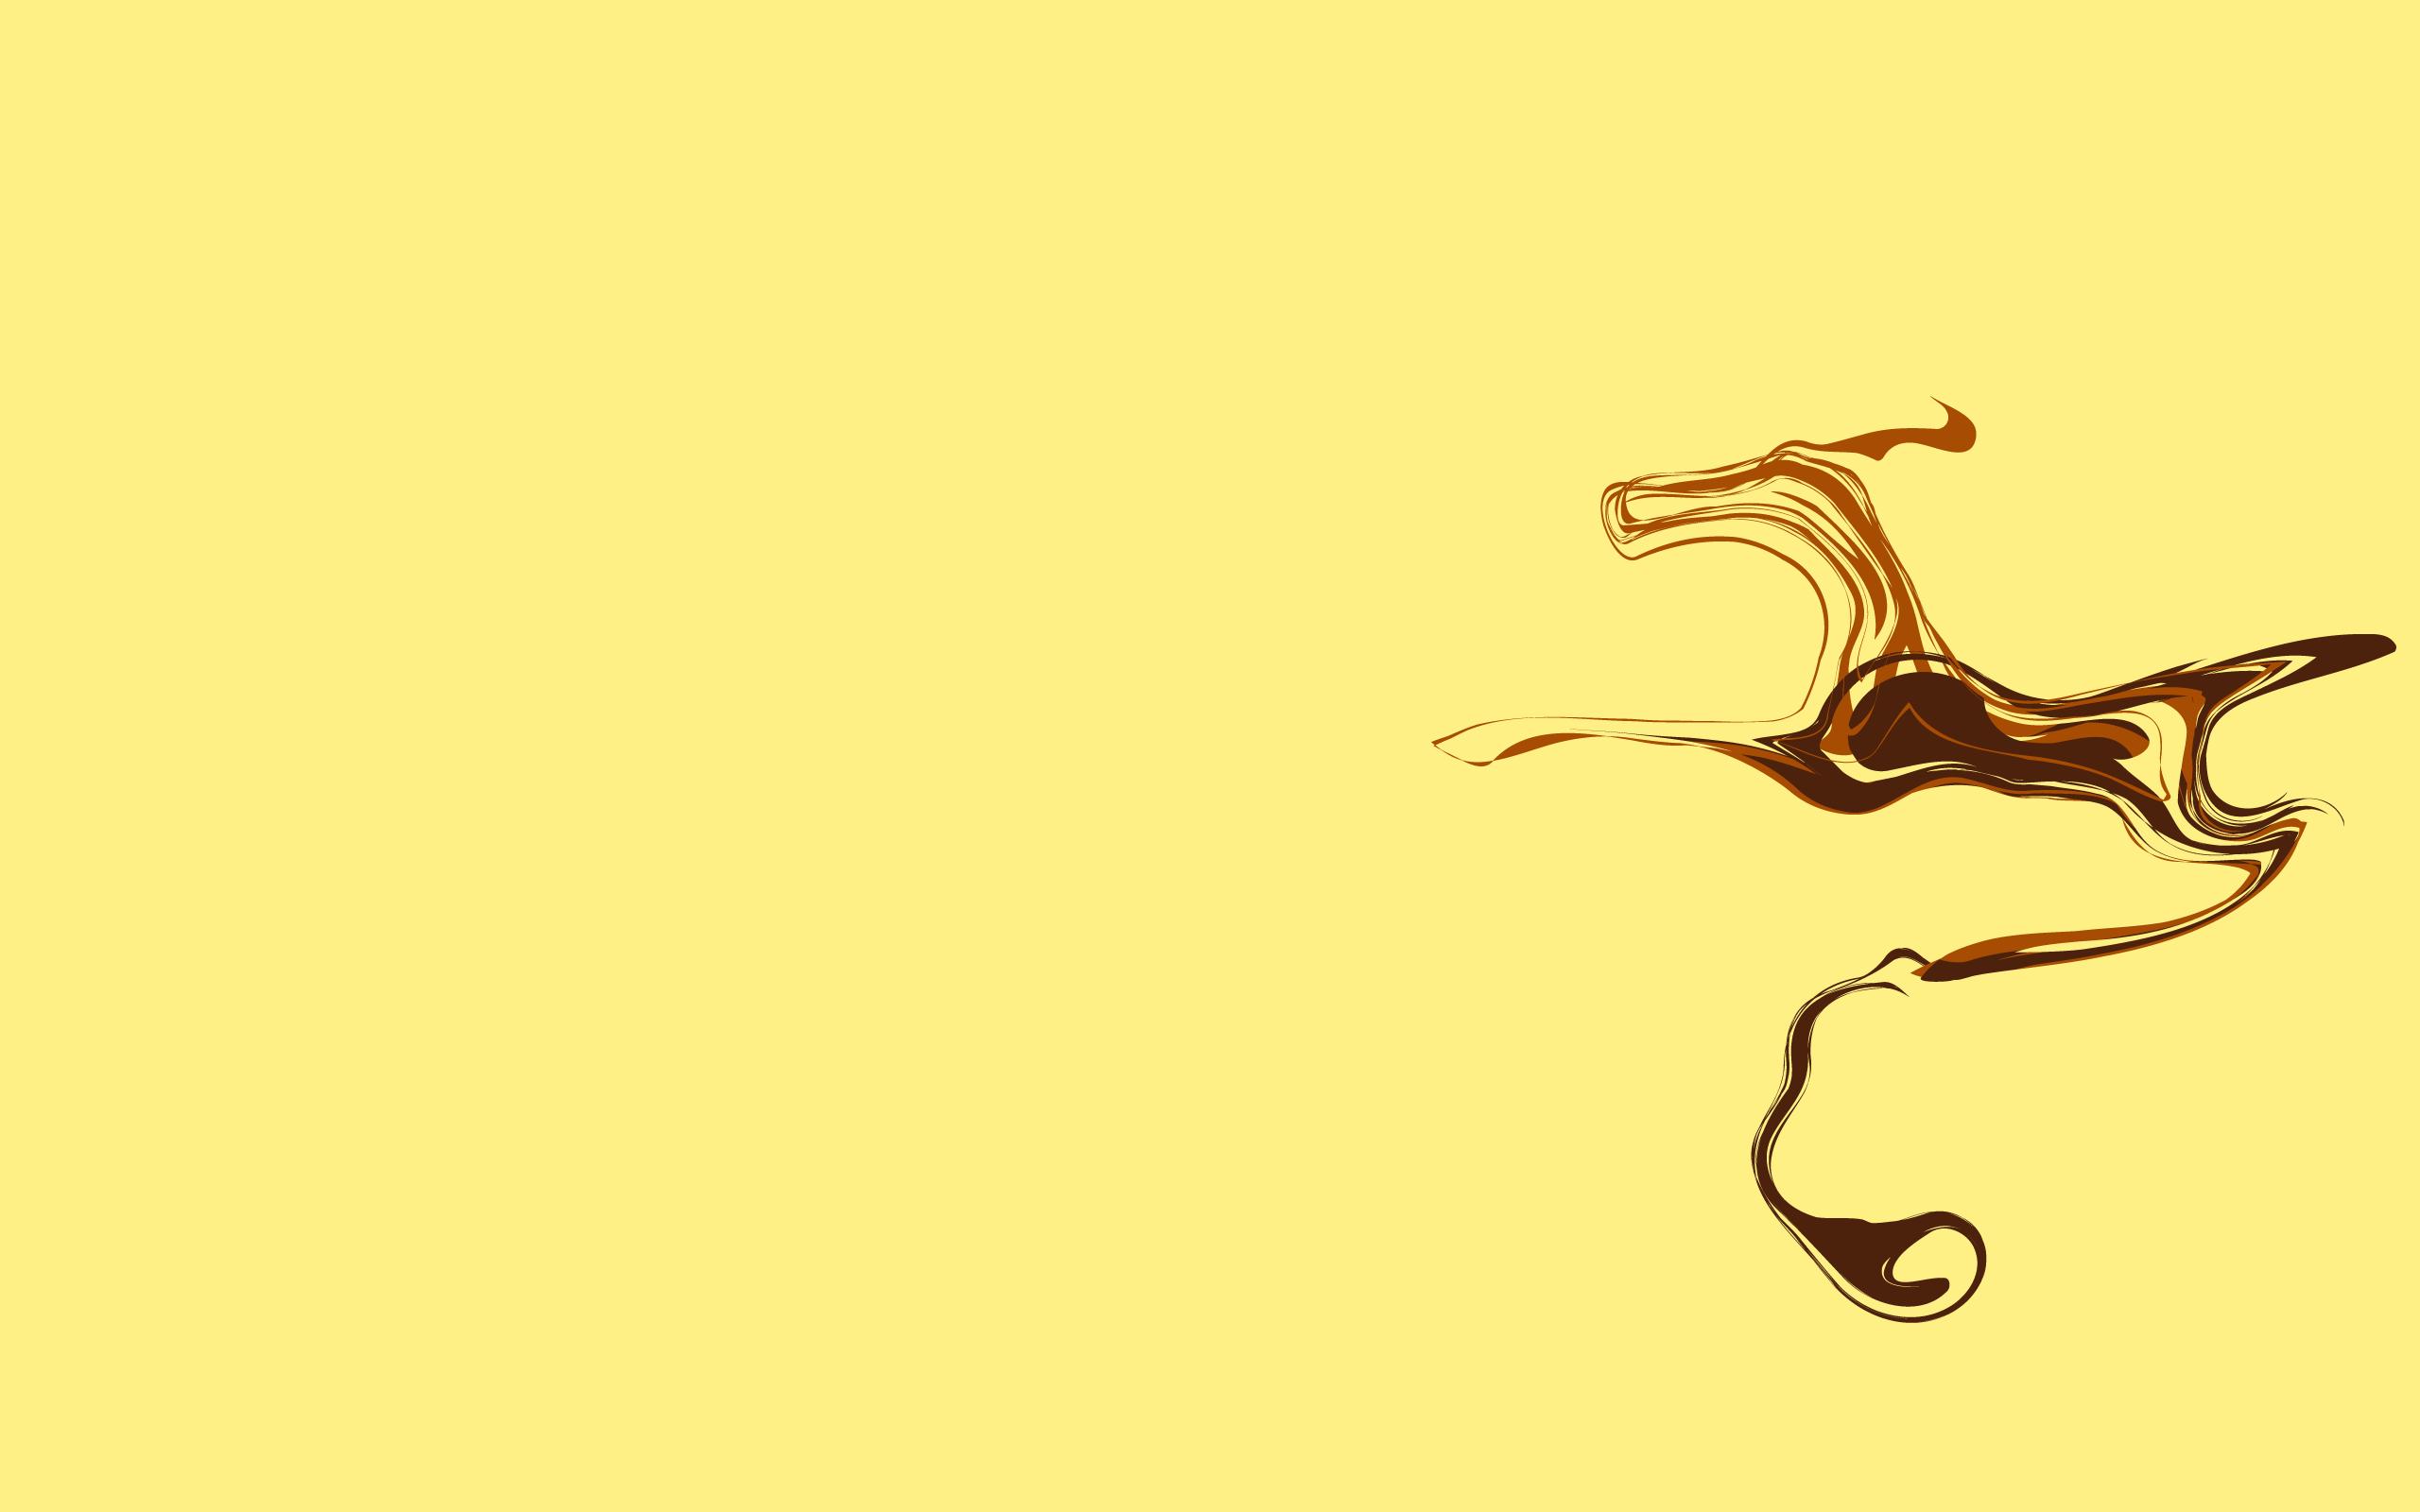 wallpapers/venom.png